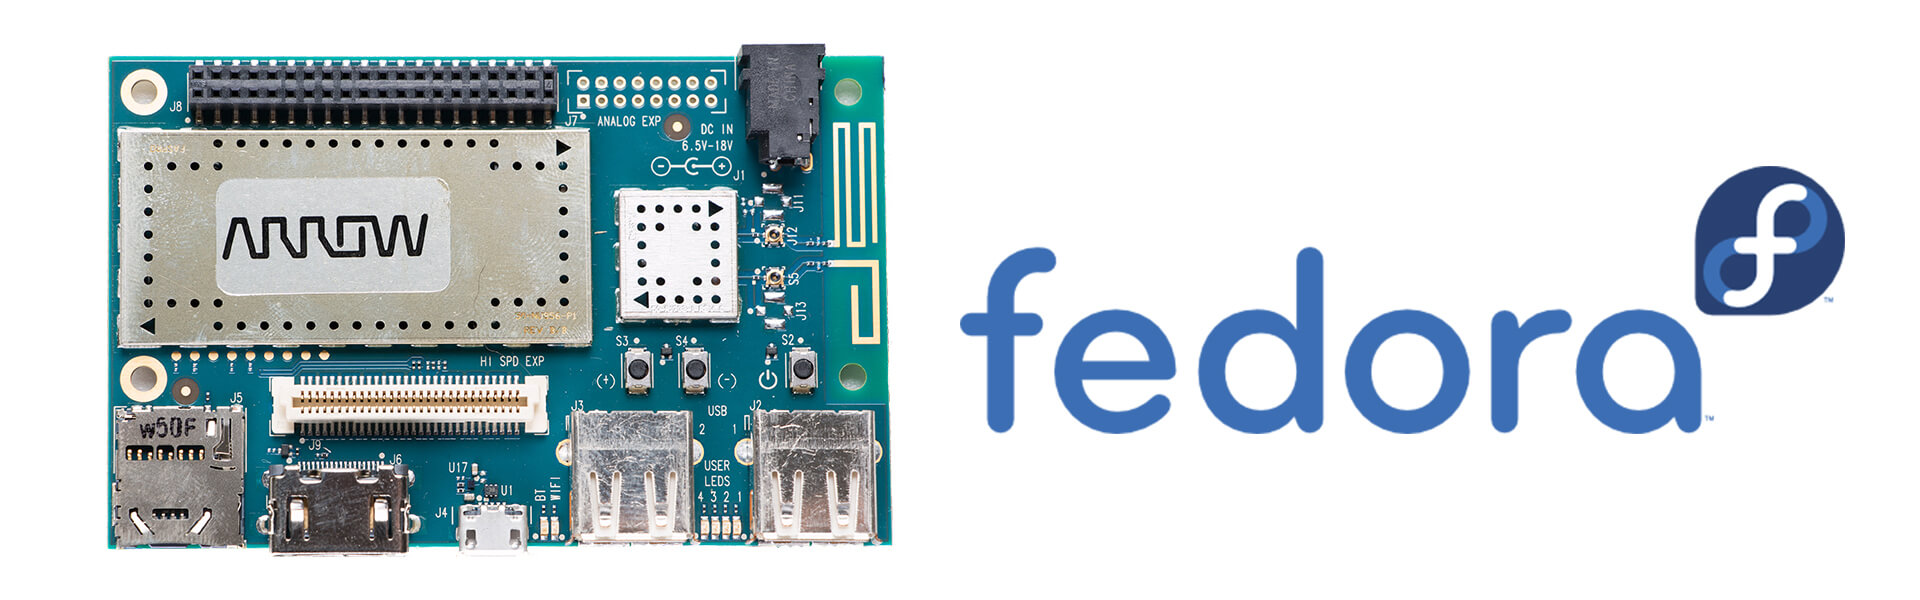 Hello Fedora on ARM - 96Boards